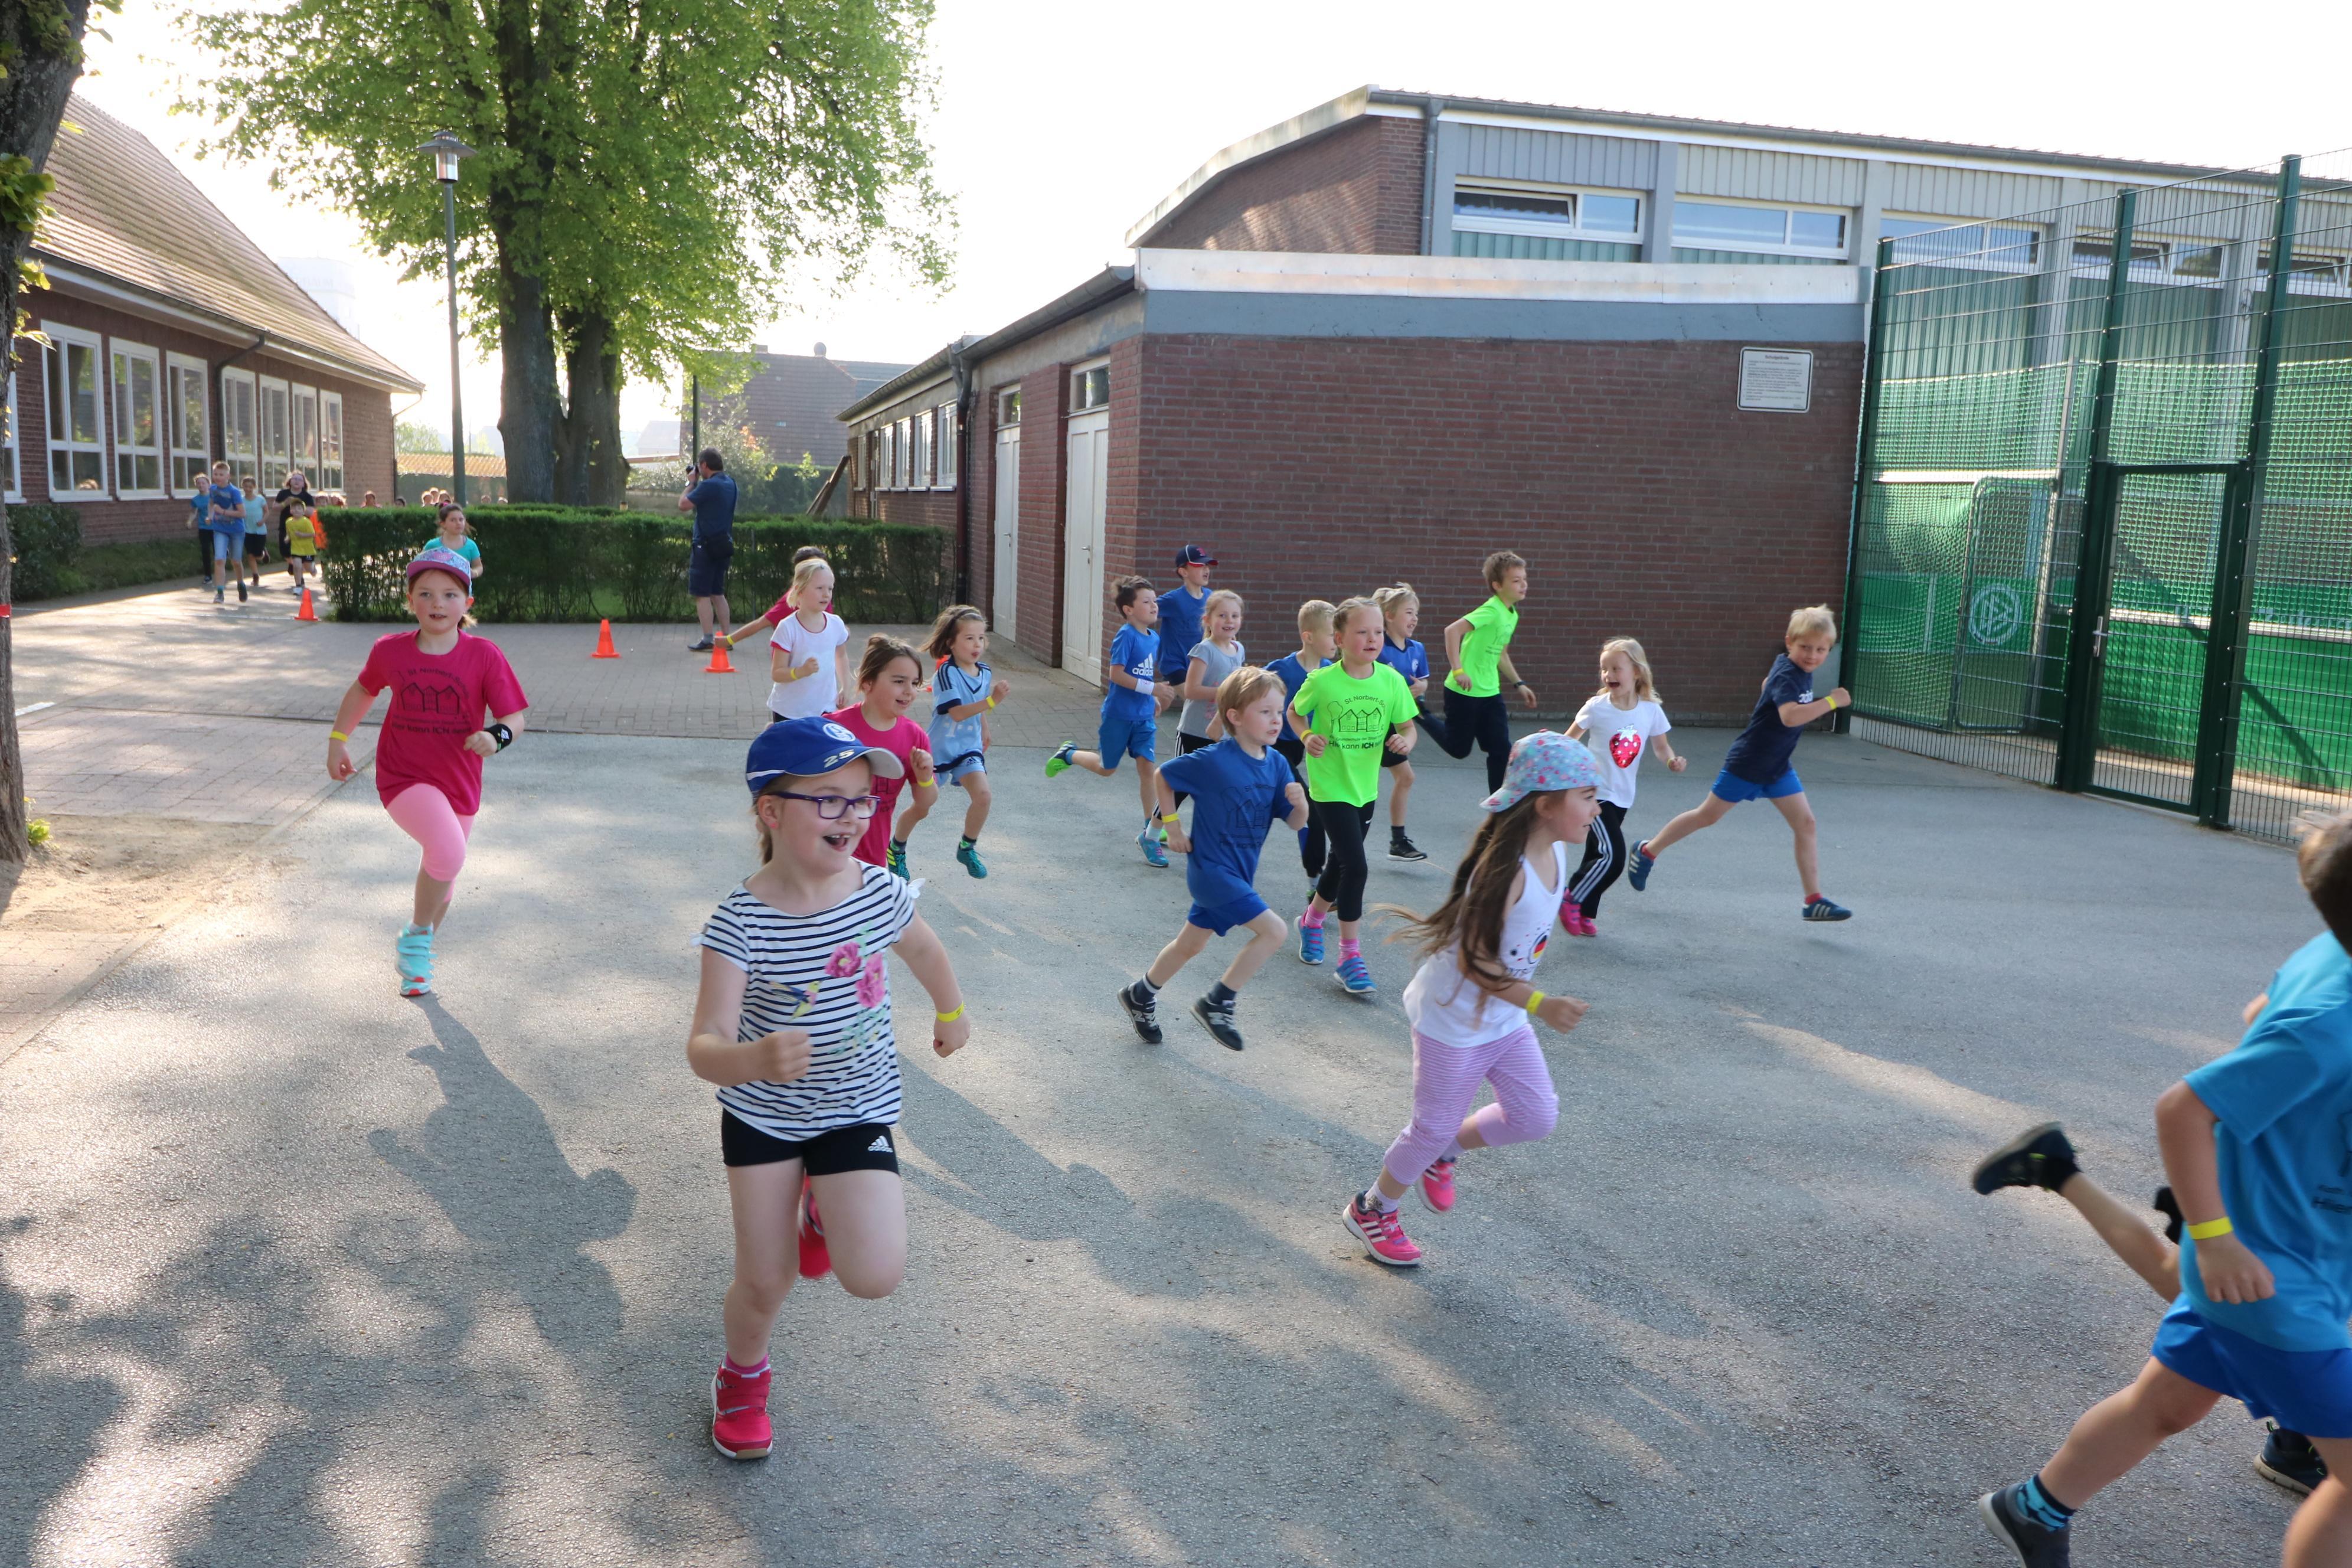 St. Norbert Schule - Katholische Grundschule der Stadt Vreden